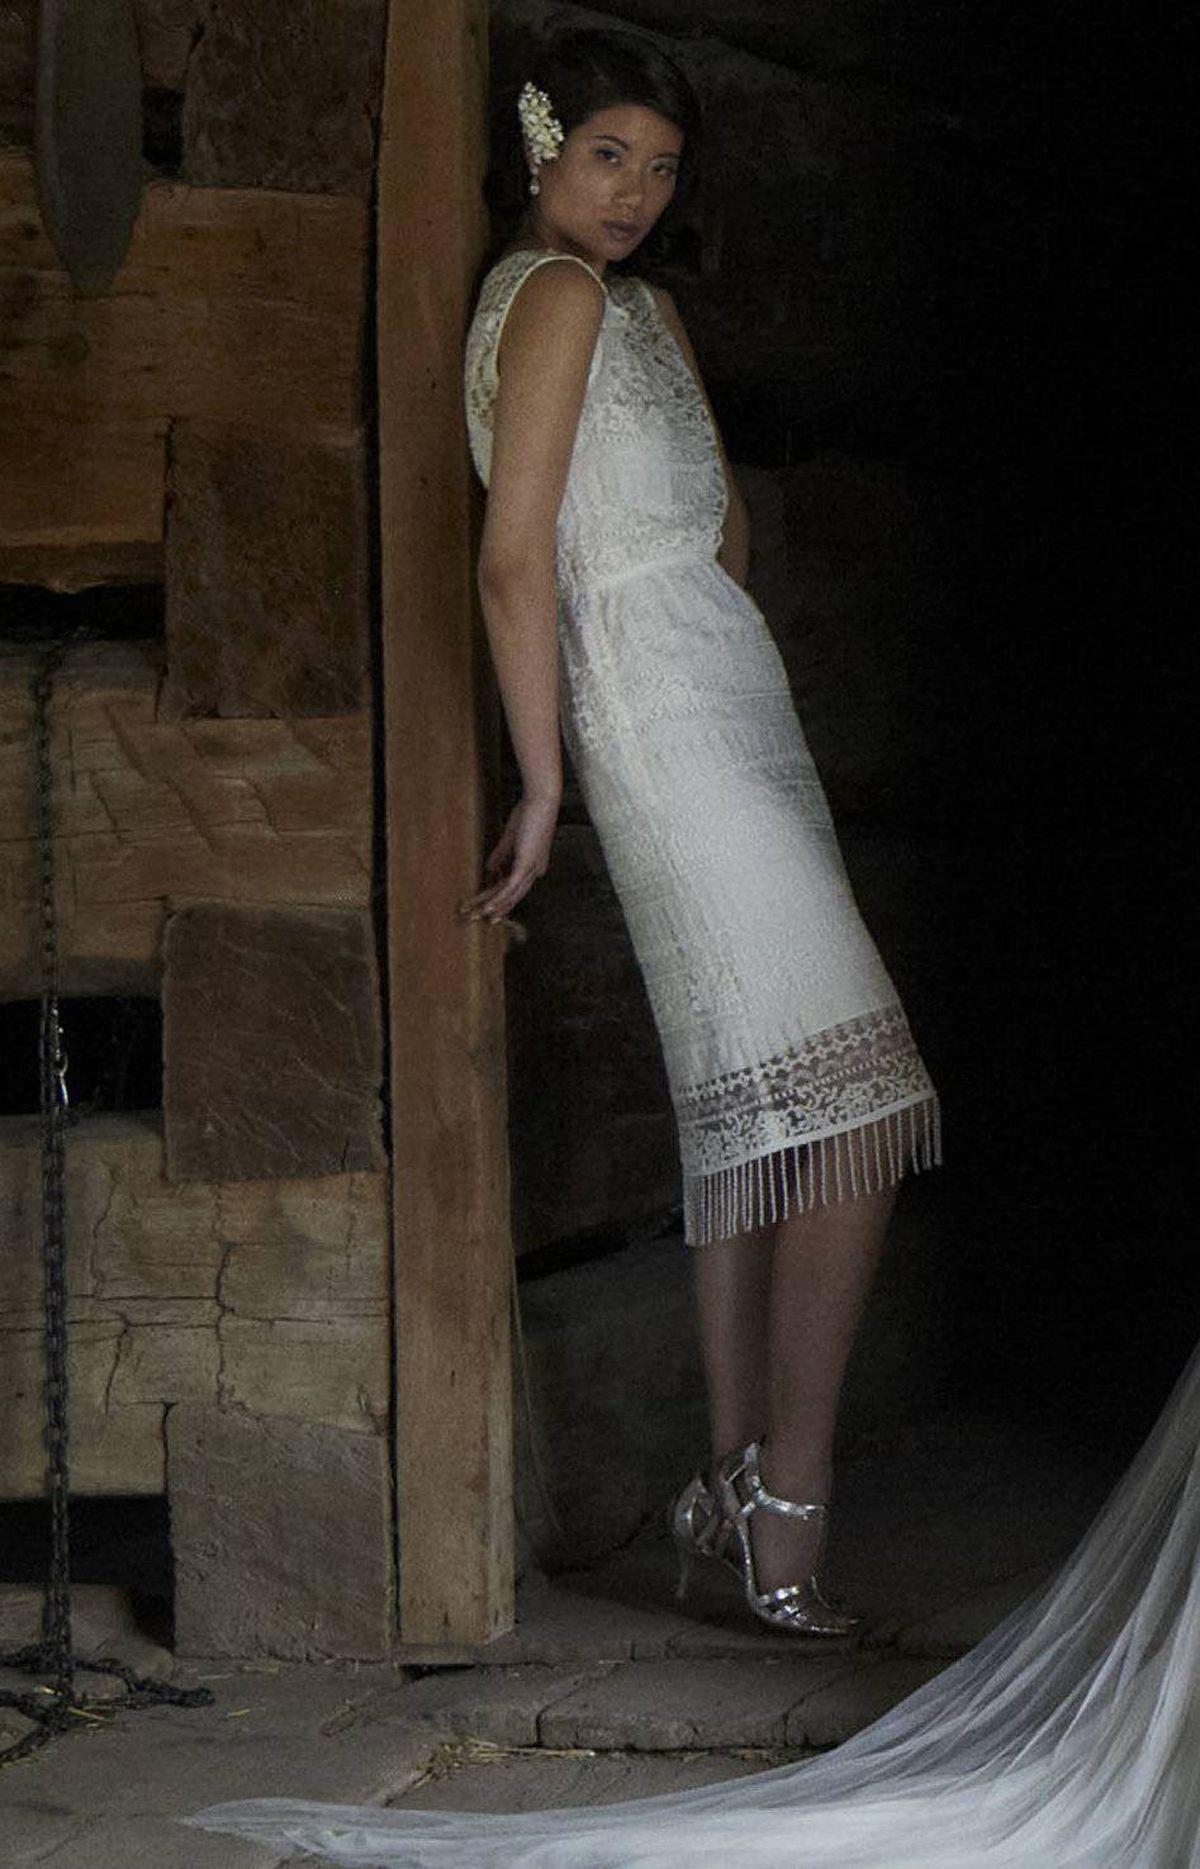 Alice and Olivia lace dress, $595 at Holt Renfrew (www.holtrenfrew.com).